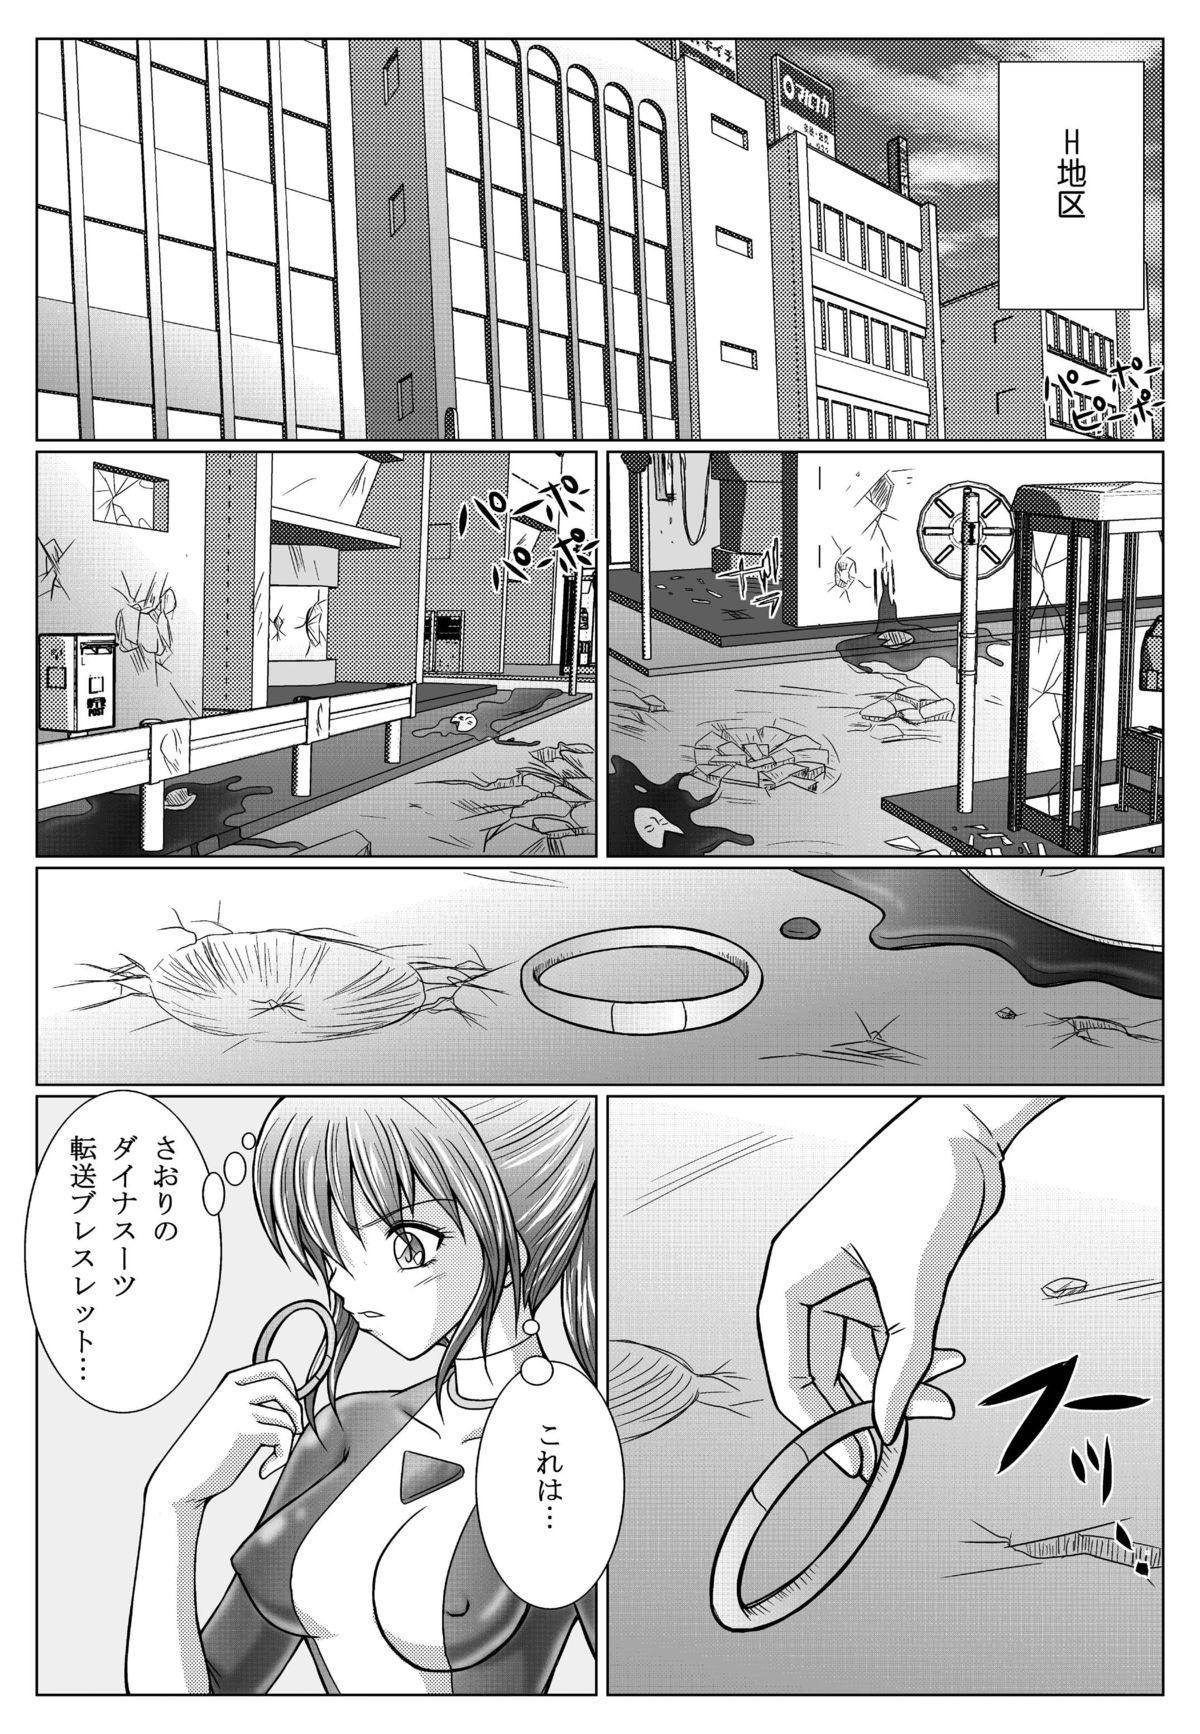 [Macxe's (monmon)] Tokubousentai Dinaranger ~Heroine Kairaku Sennou Keikaku~ Vol.01/02/03 (Renkaban) [Digital] 45